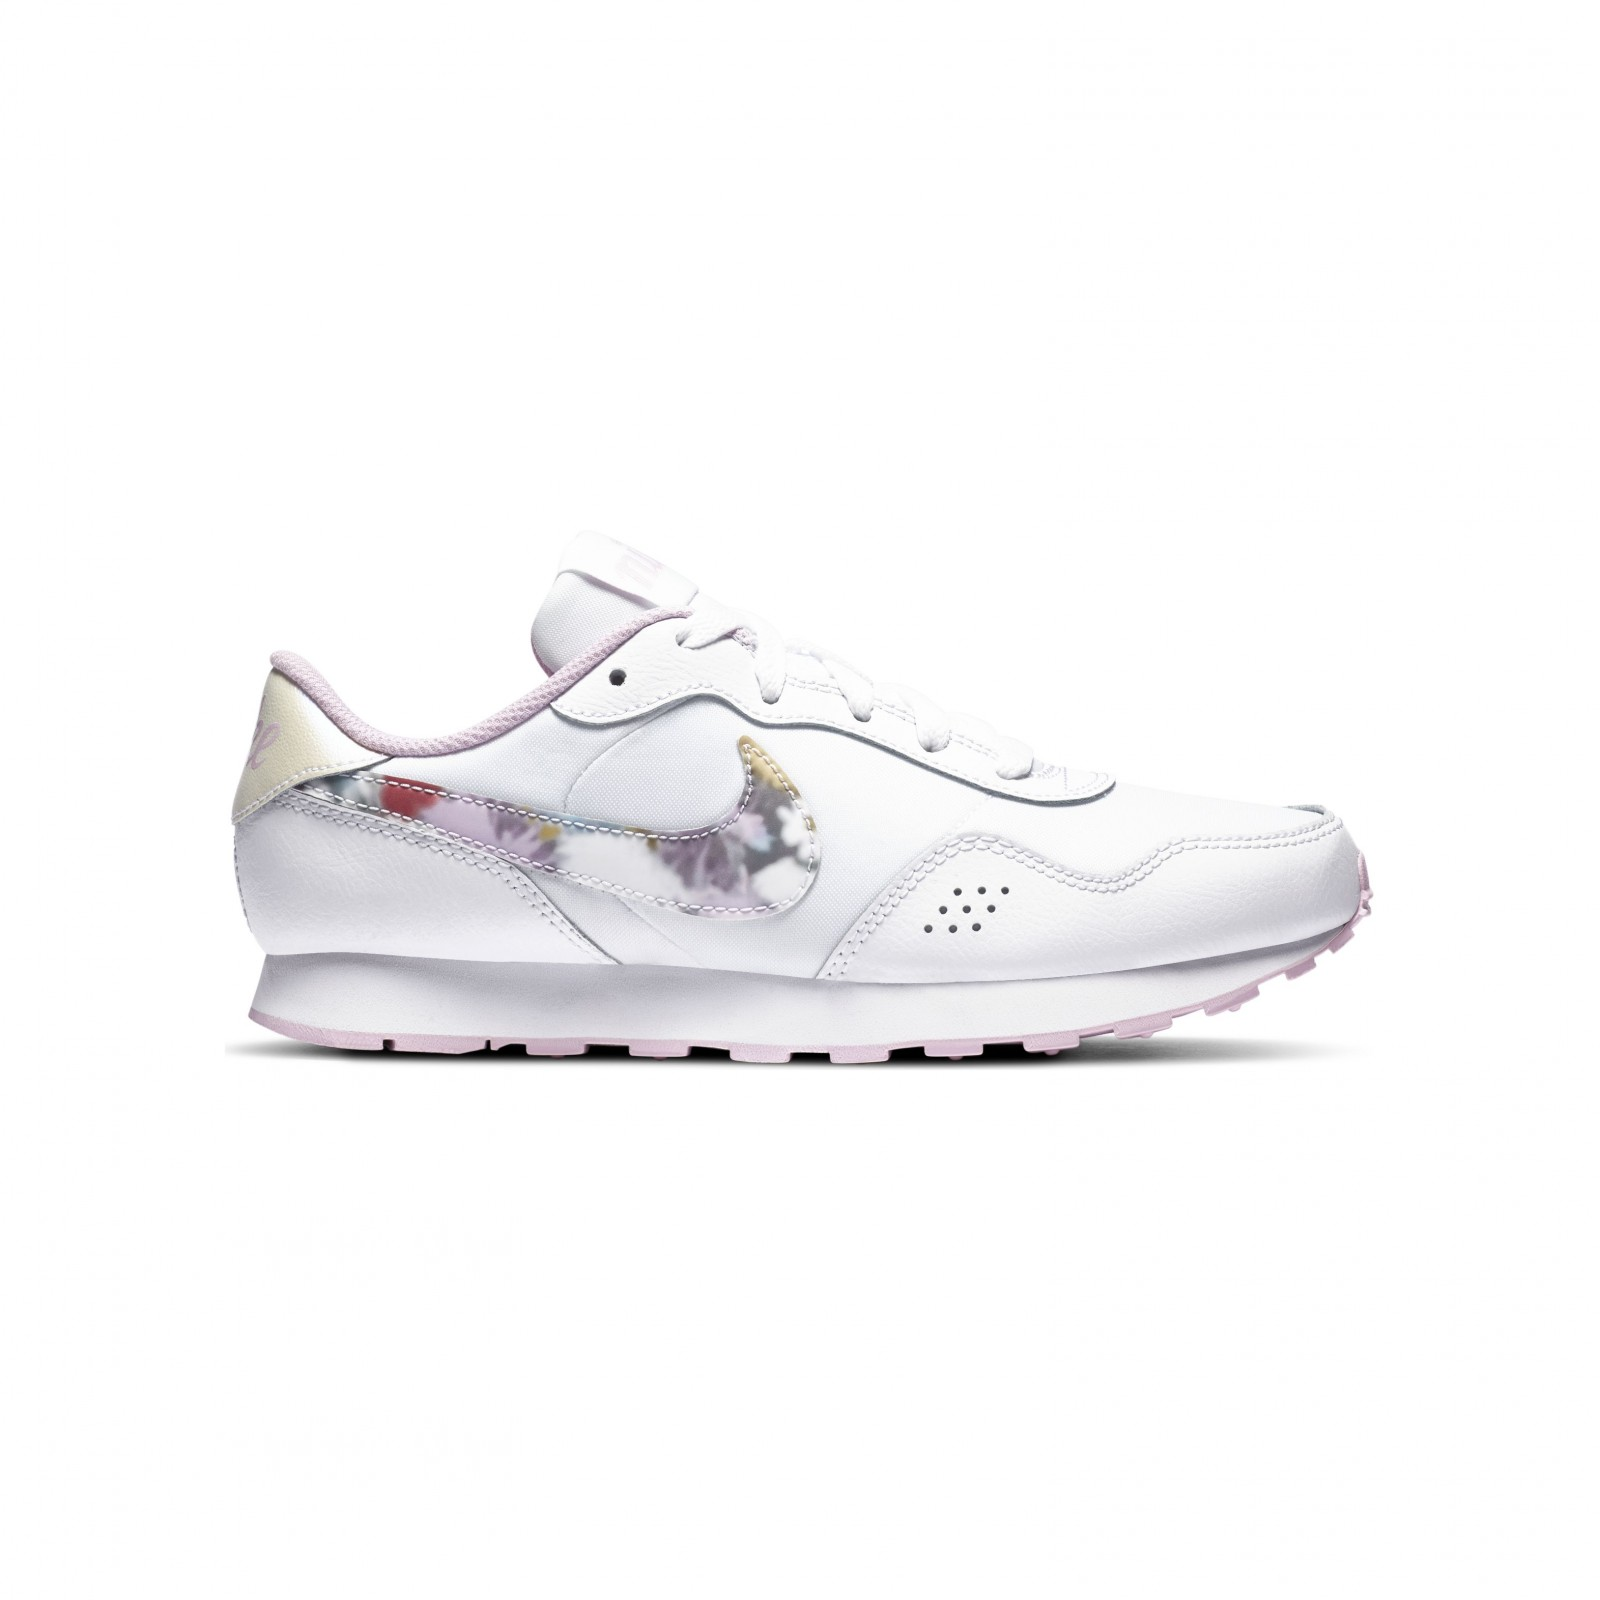 Nike md valiant flrl (gs) WHITE/LT ARCTIC PINK-LT ARCTIC PINK